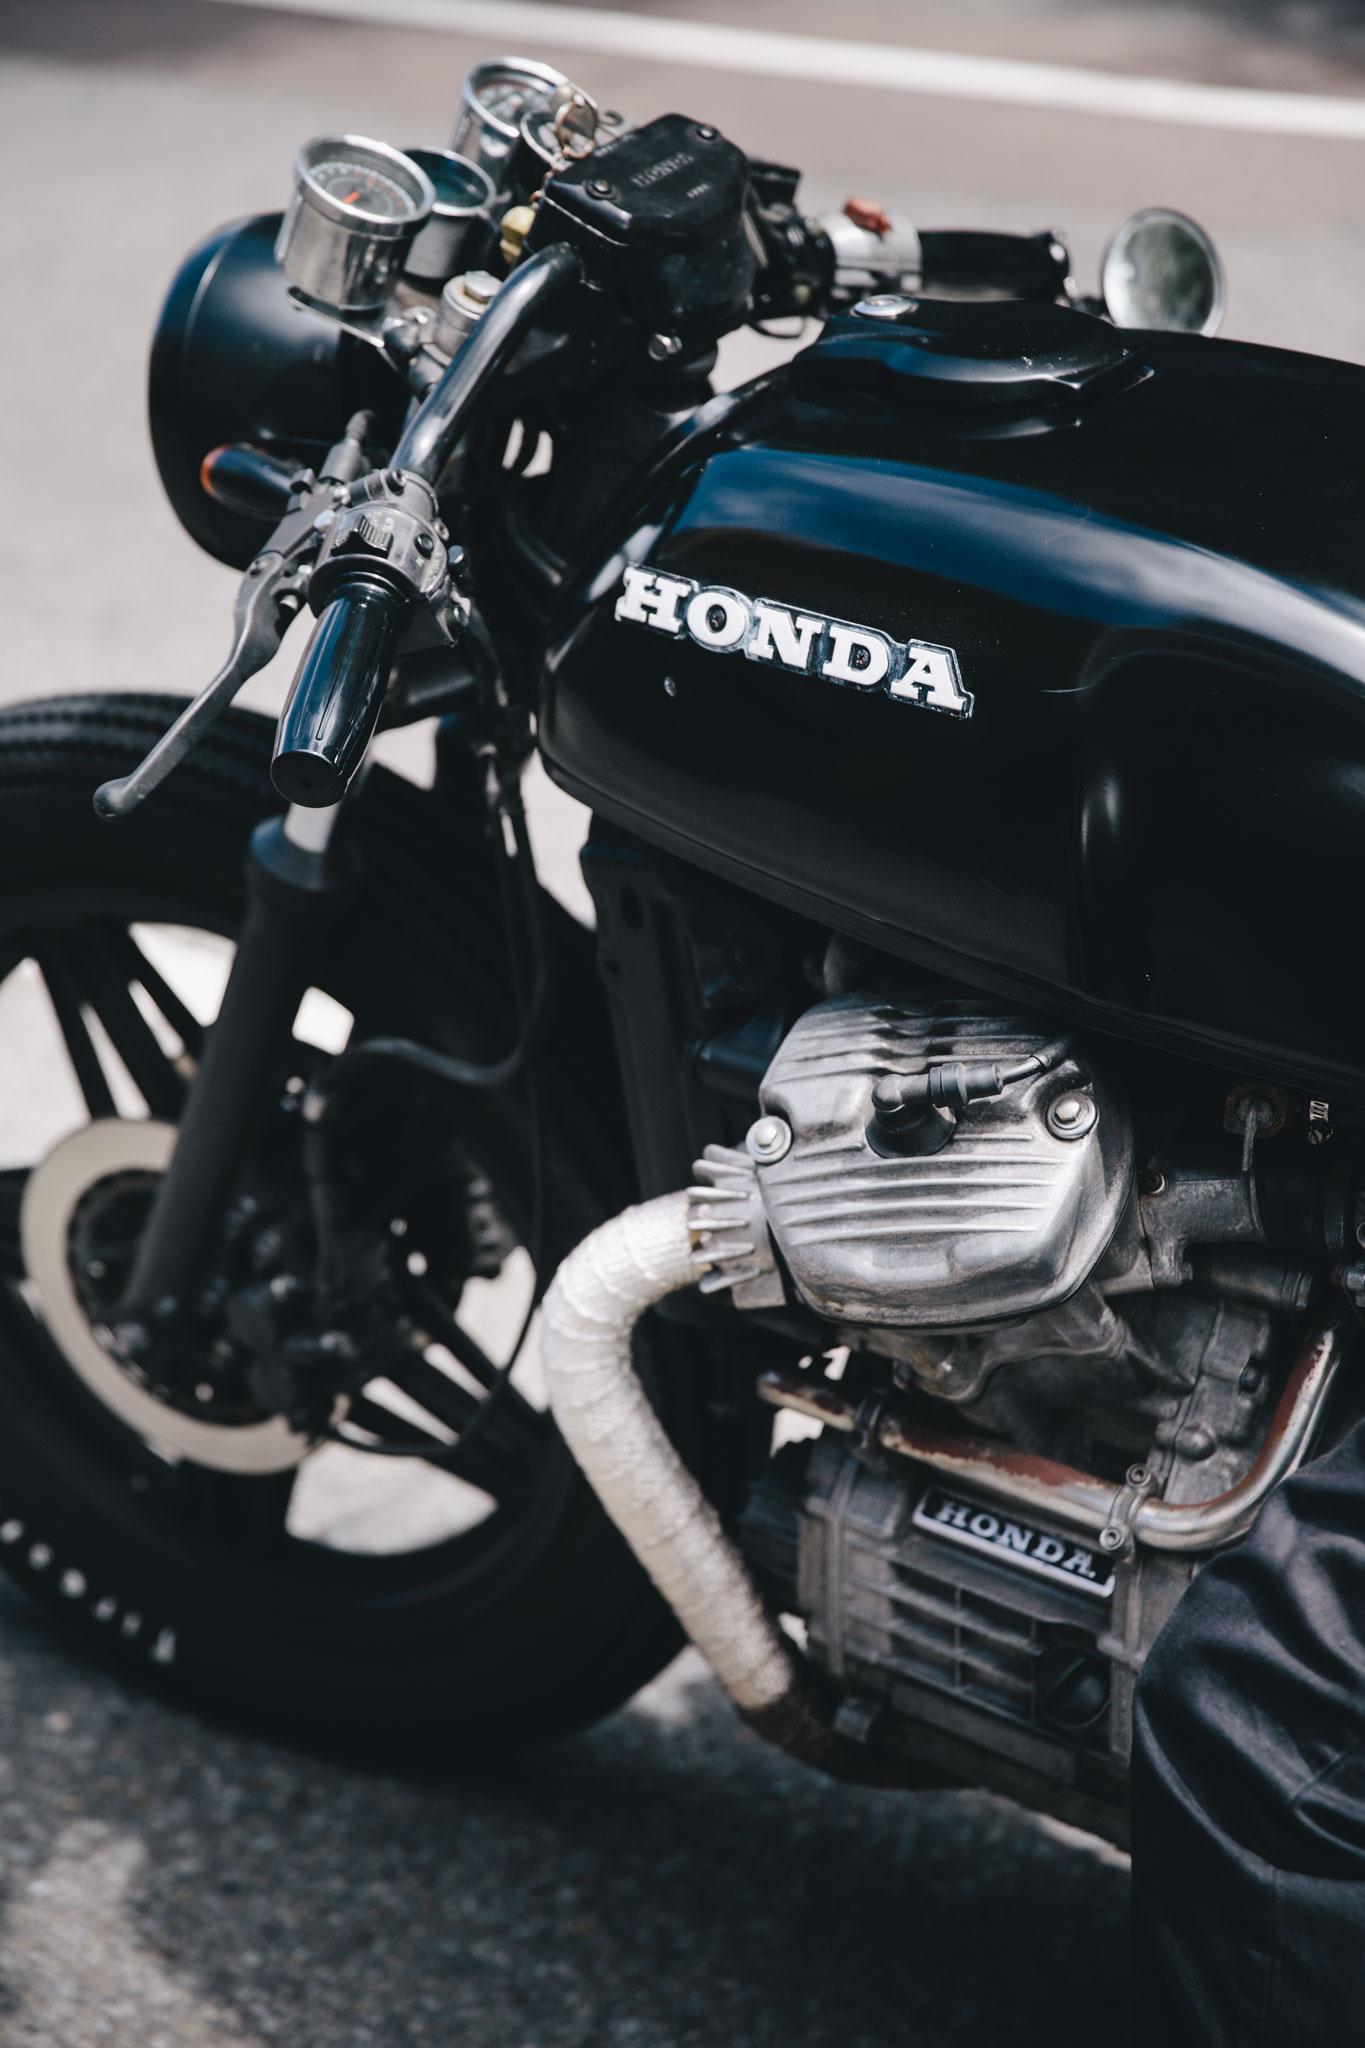 damien_honda_cx500_cafe_racer-5